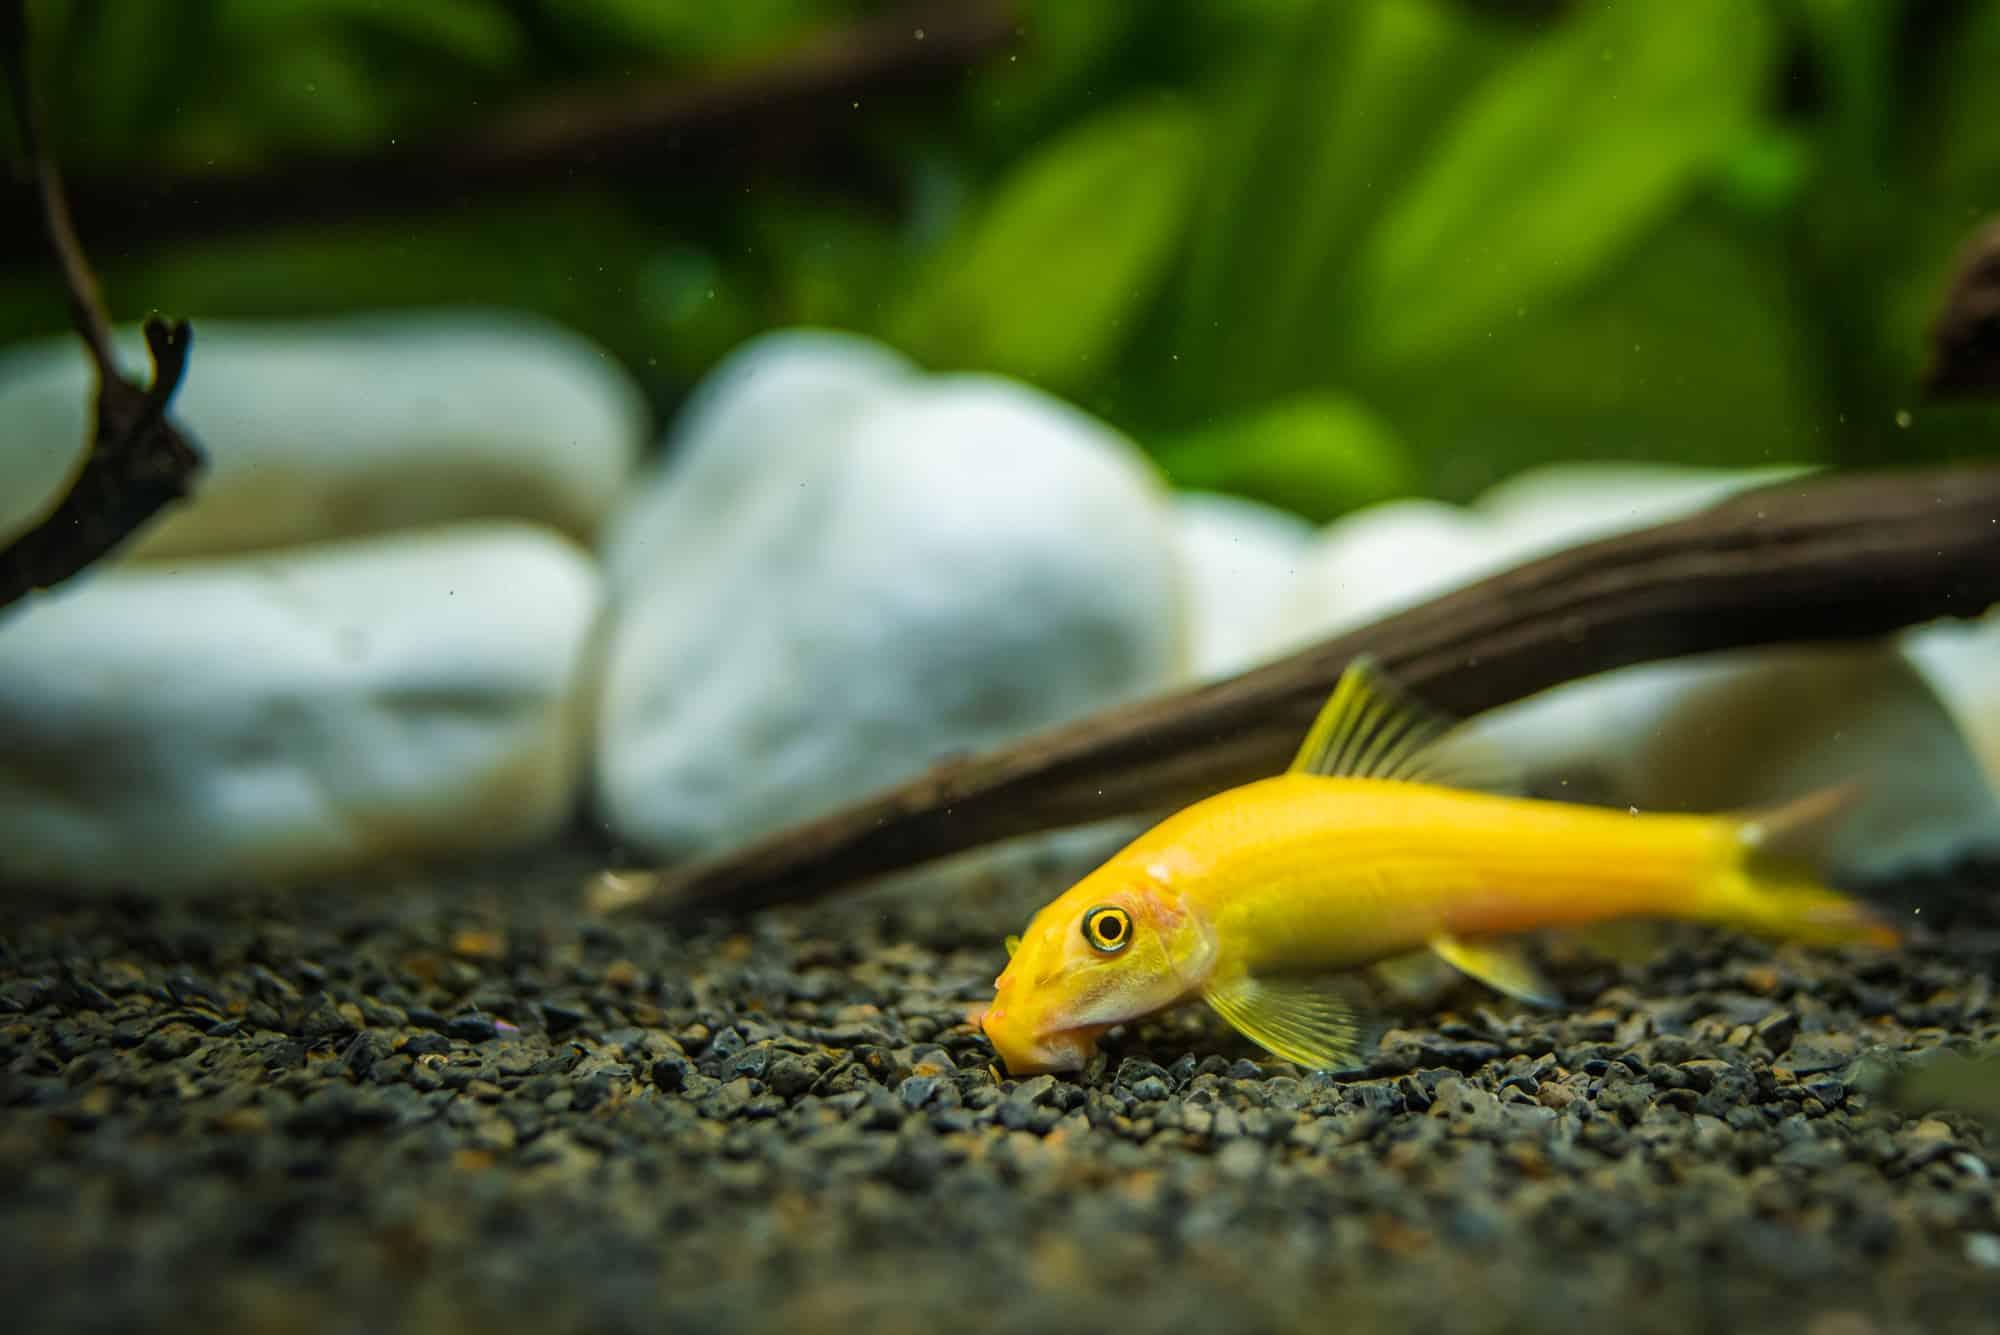 Yellow chinese algaey eater - Gyrinocheilus in fishtank cleaning gravel.